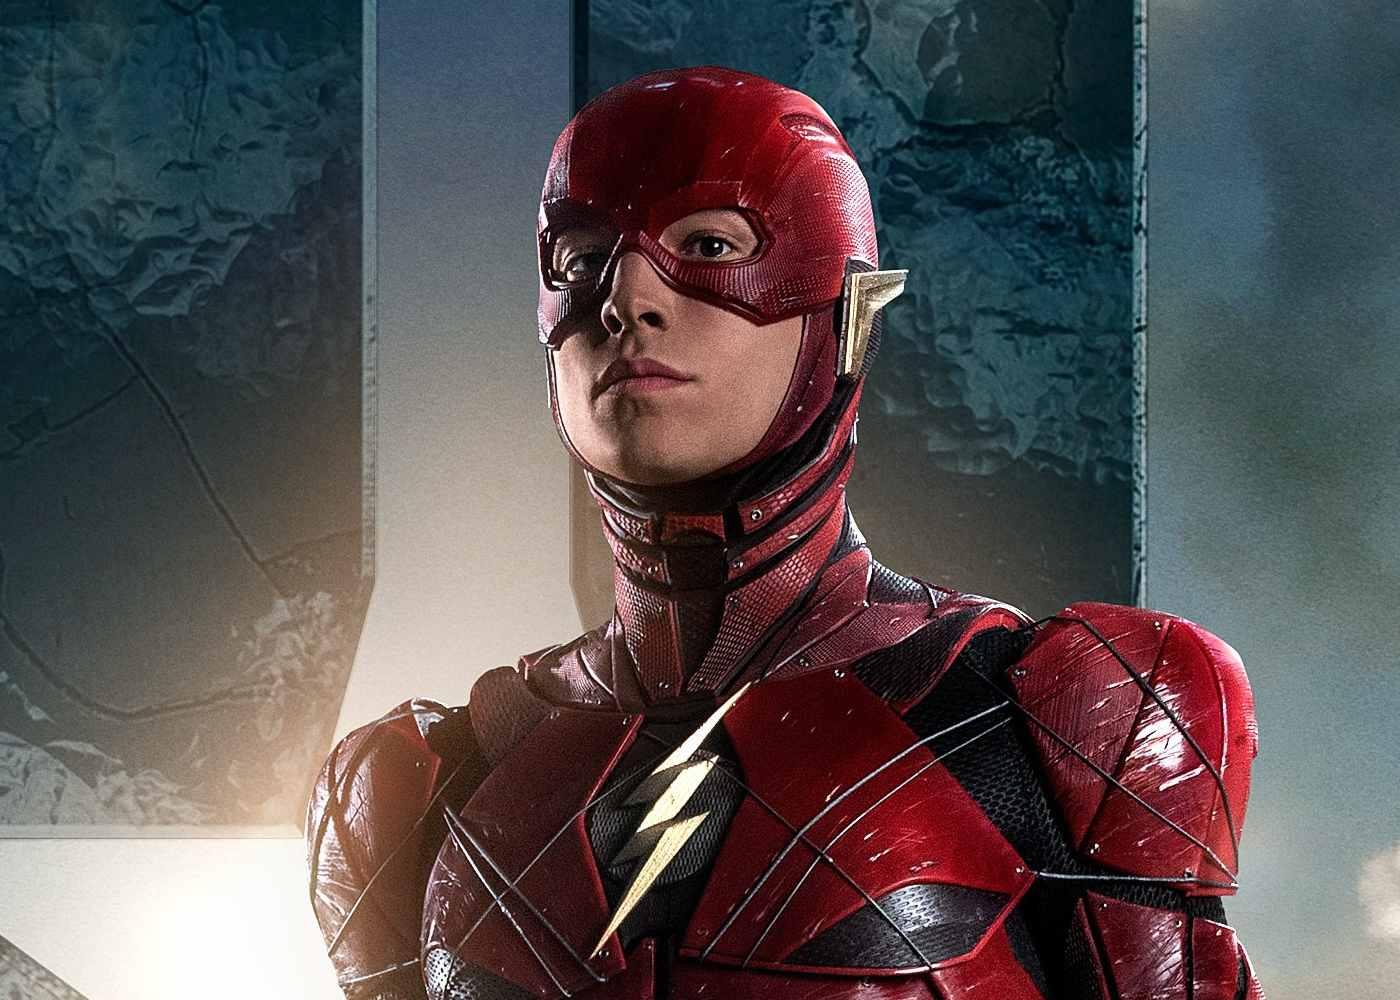 Director Robert Zemeckis is Frontrunner for The Flash Film